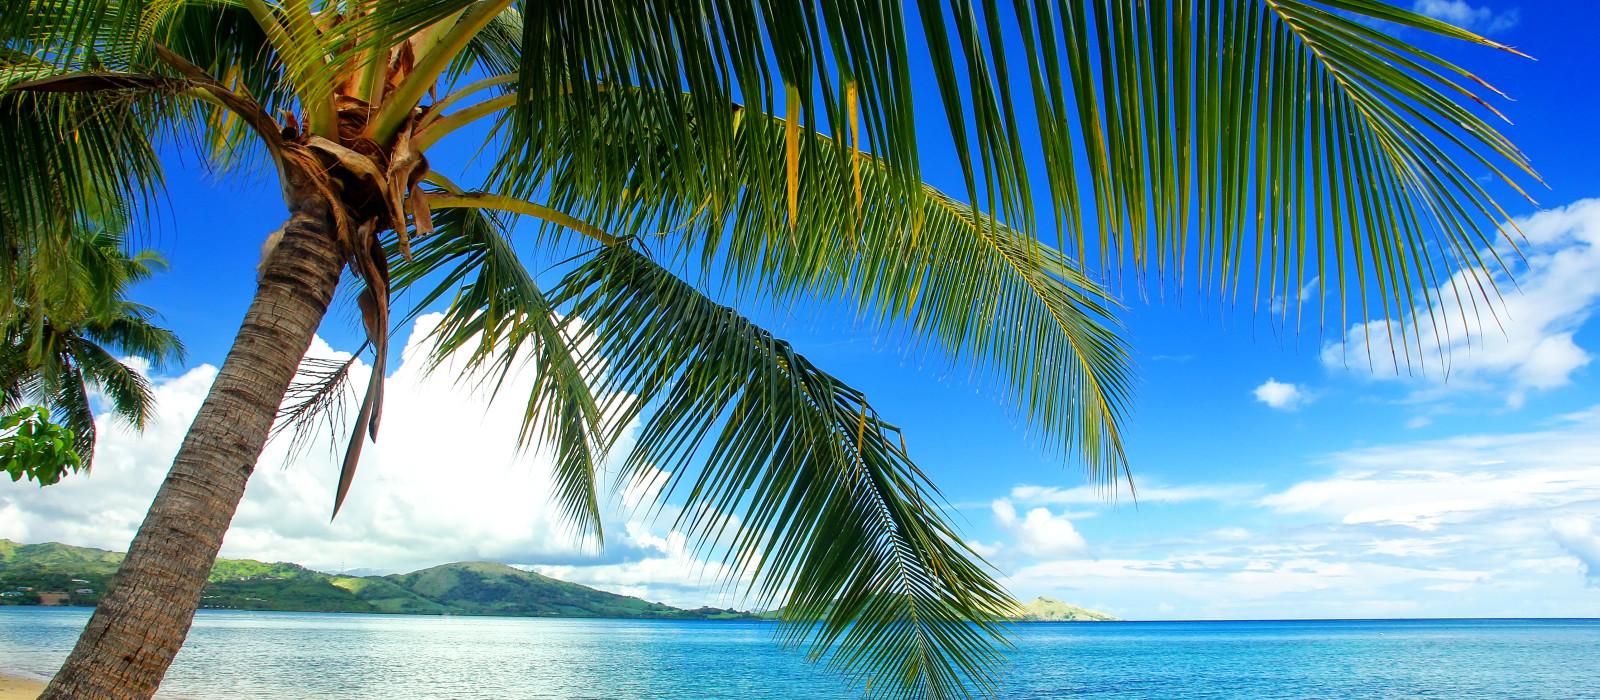 Destination Rakiraki/ Viti Levu Fiji